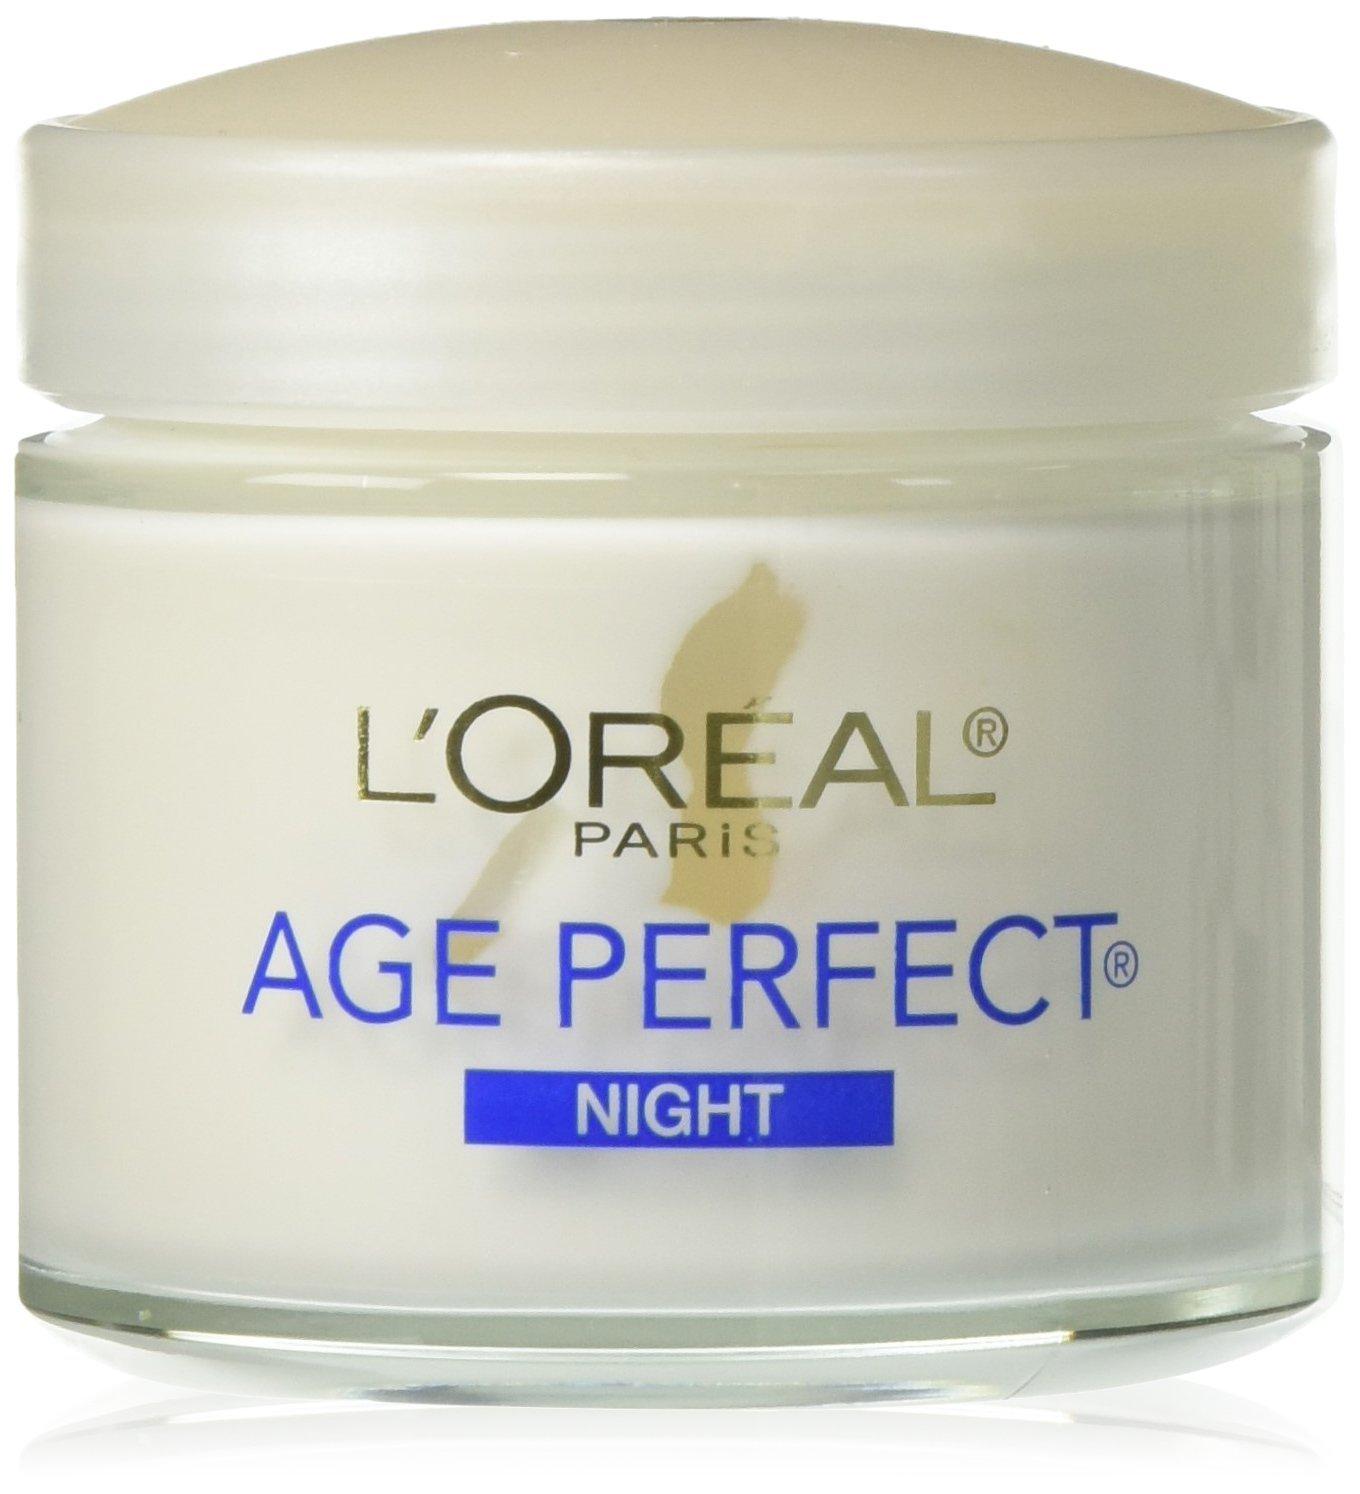 L'Oréal Paris Age Perfect Night Cream Face Moisturizer to Firm Skin Bonus Pack, 3.4 oz.